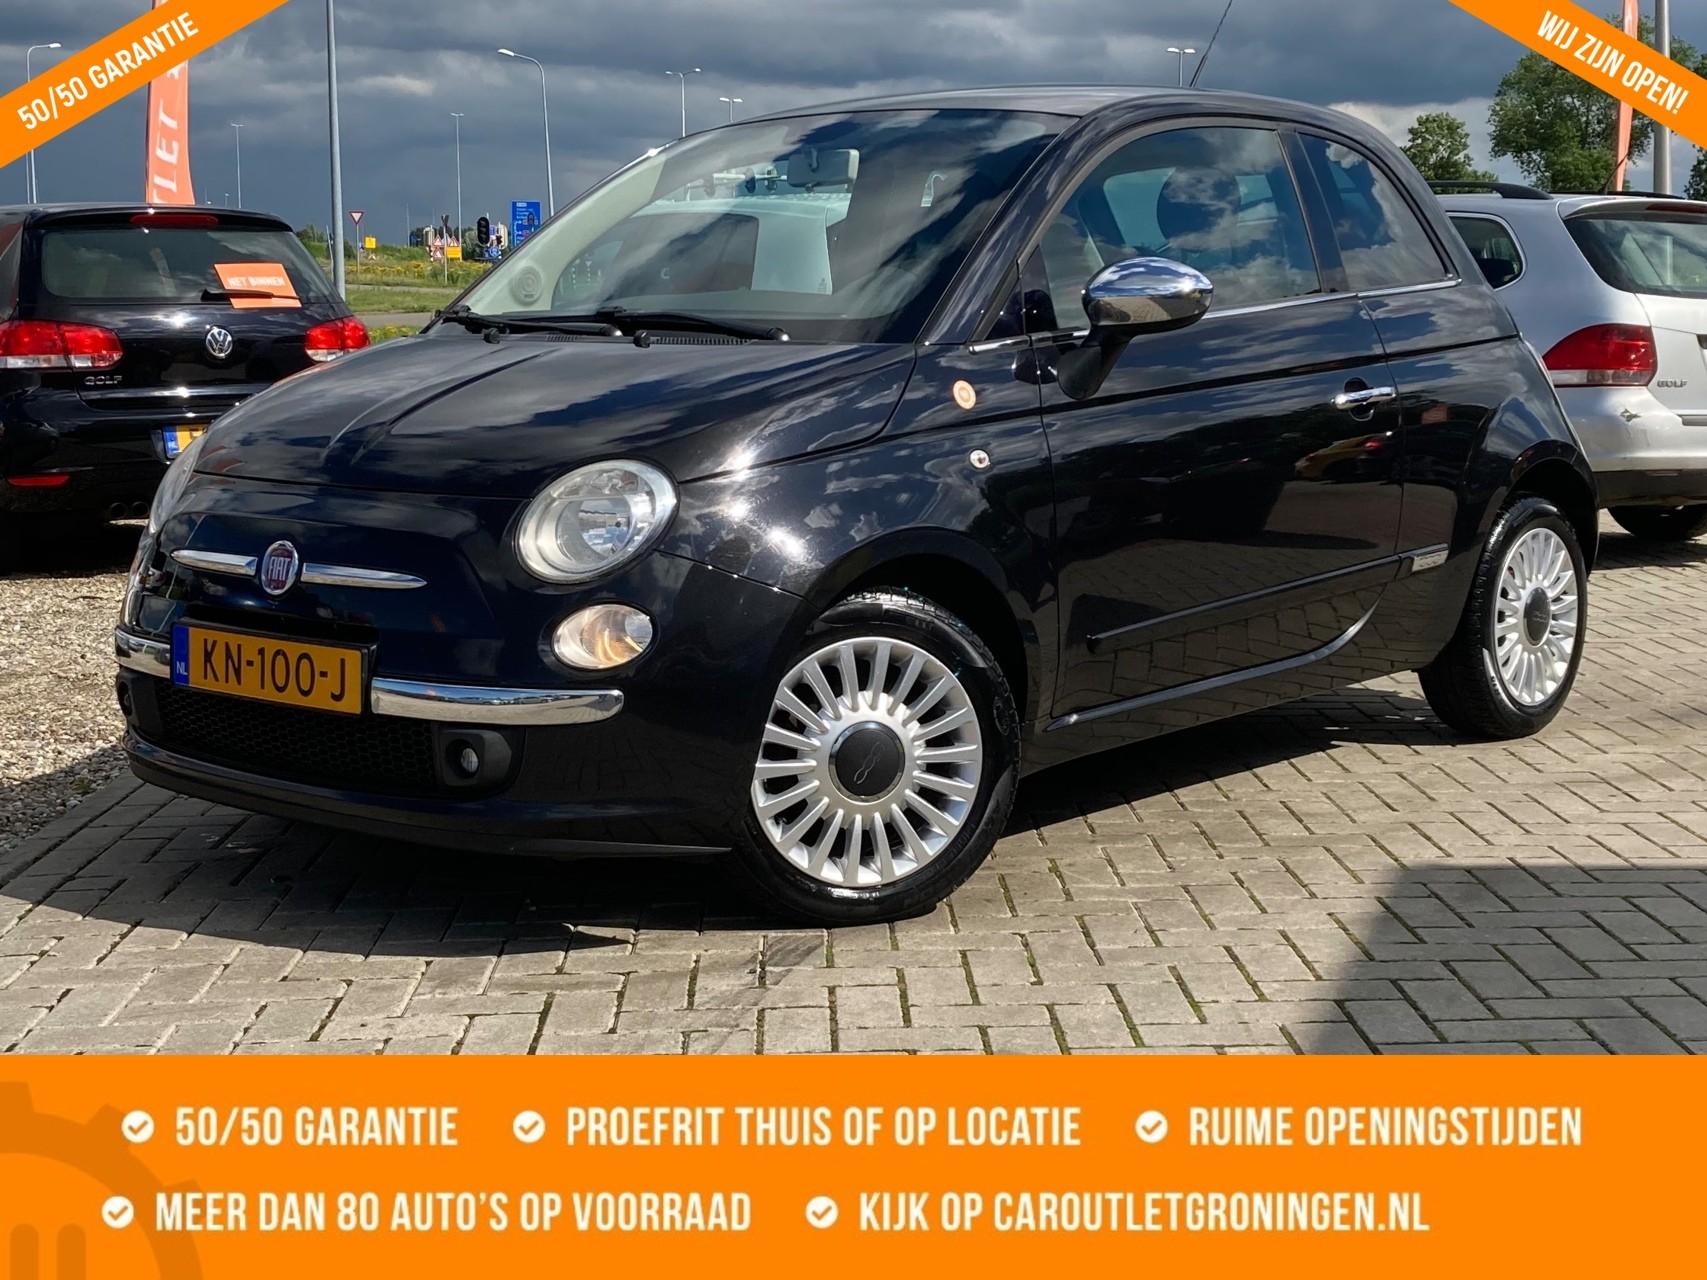 Caroutlet Groningen - Fiat 500 1.2 Lounge   PANORAMADAK   LEER   LMV